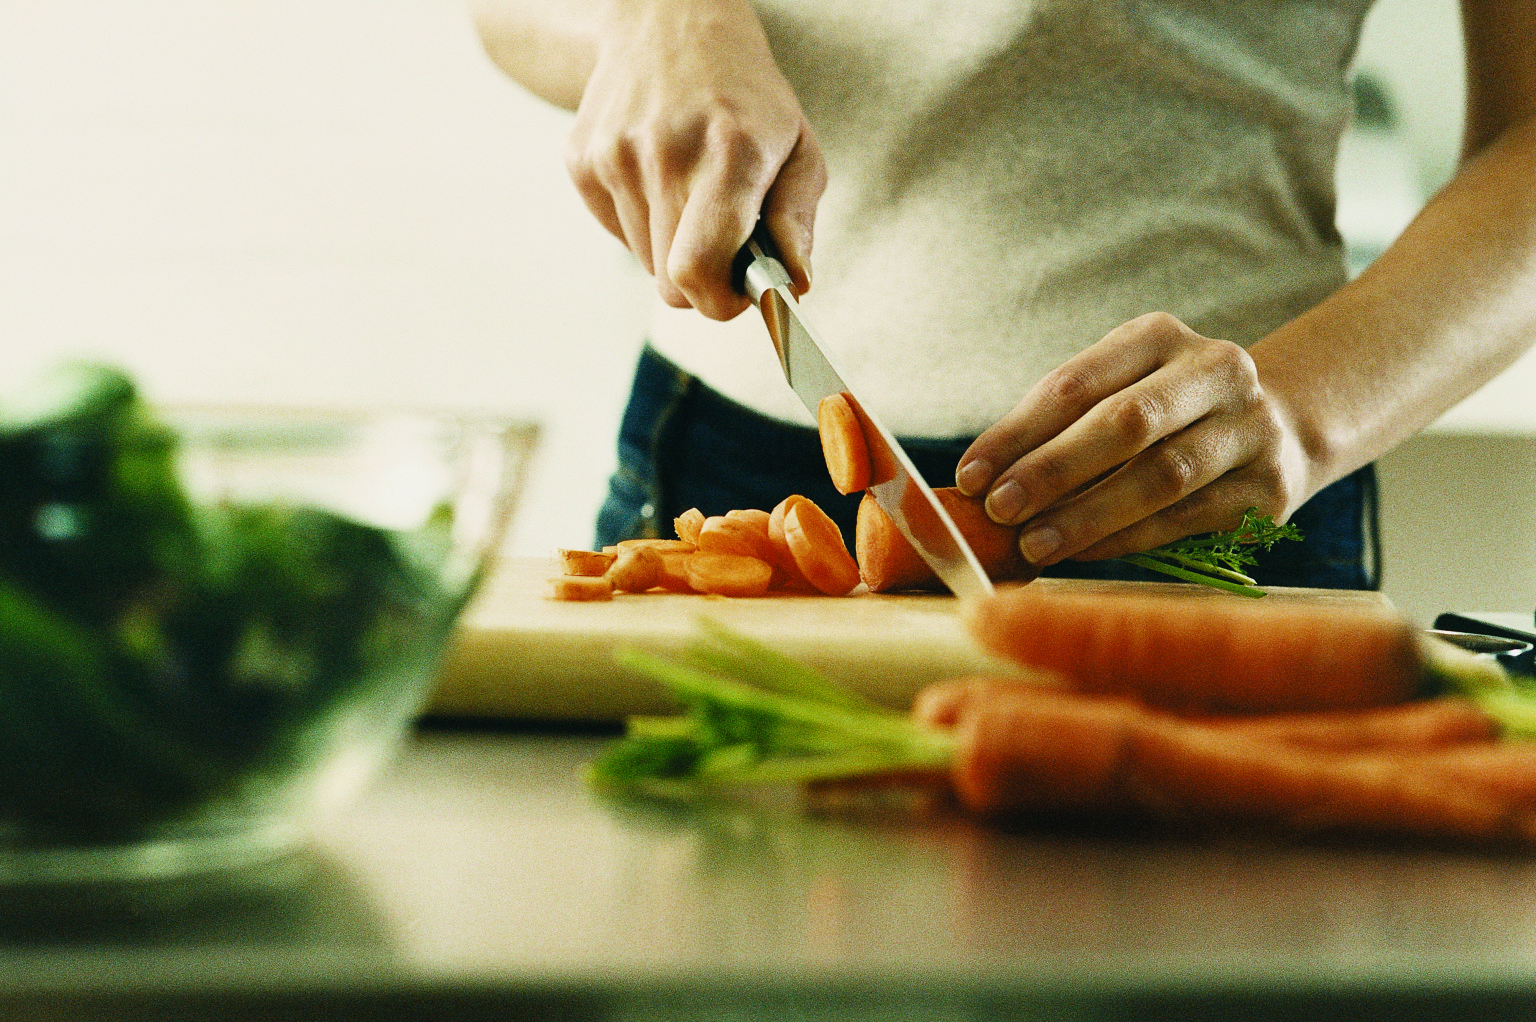 Vegetables Cut Up